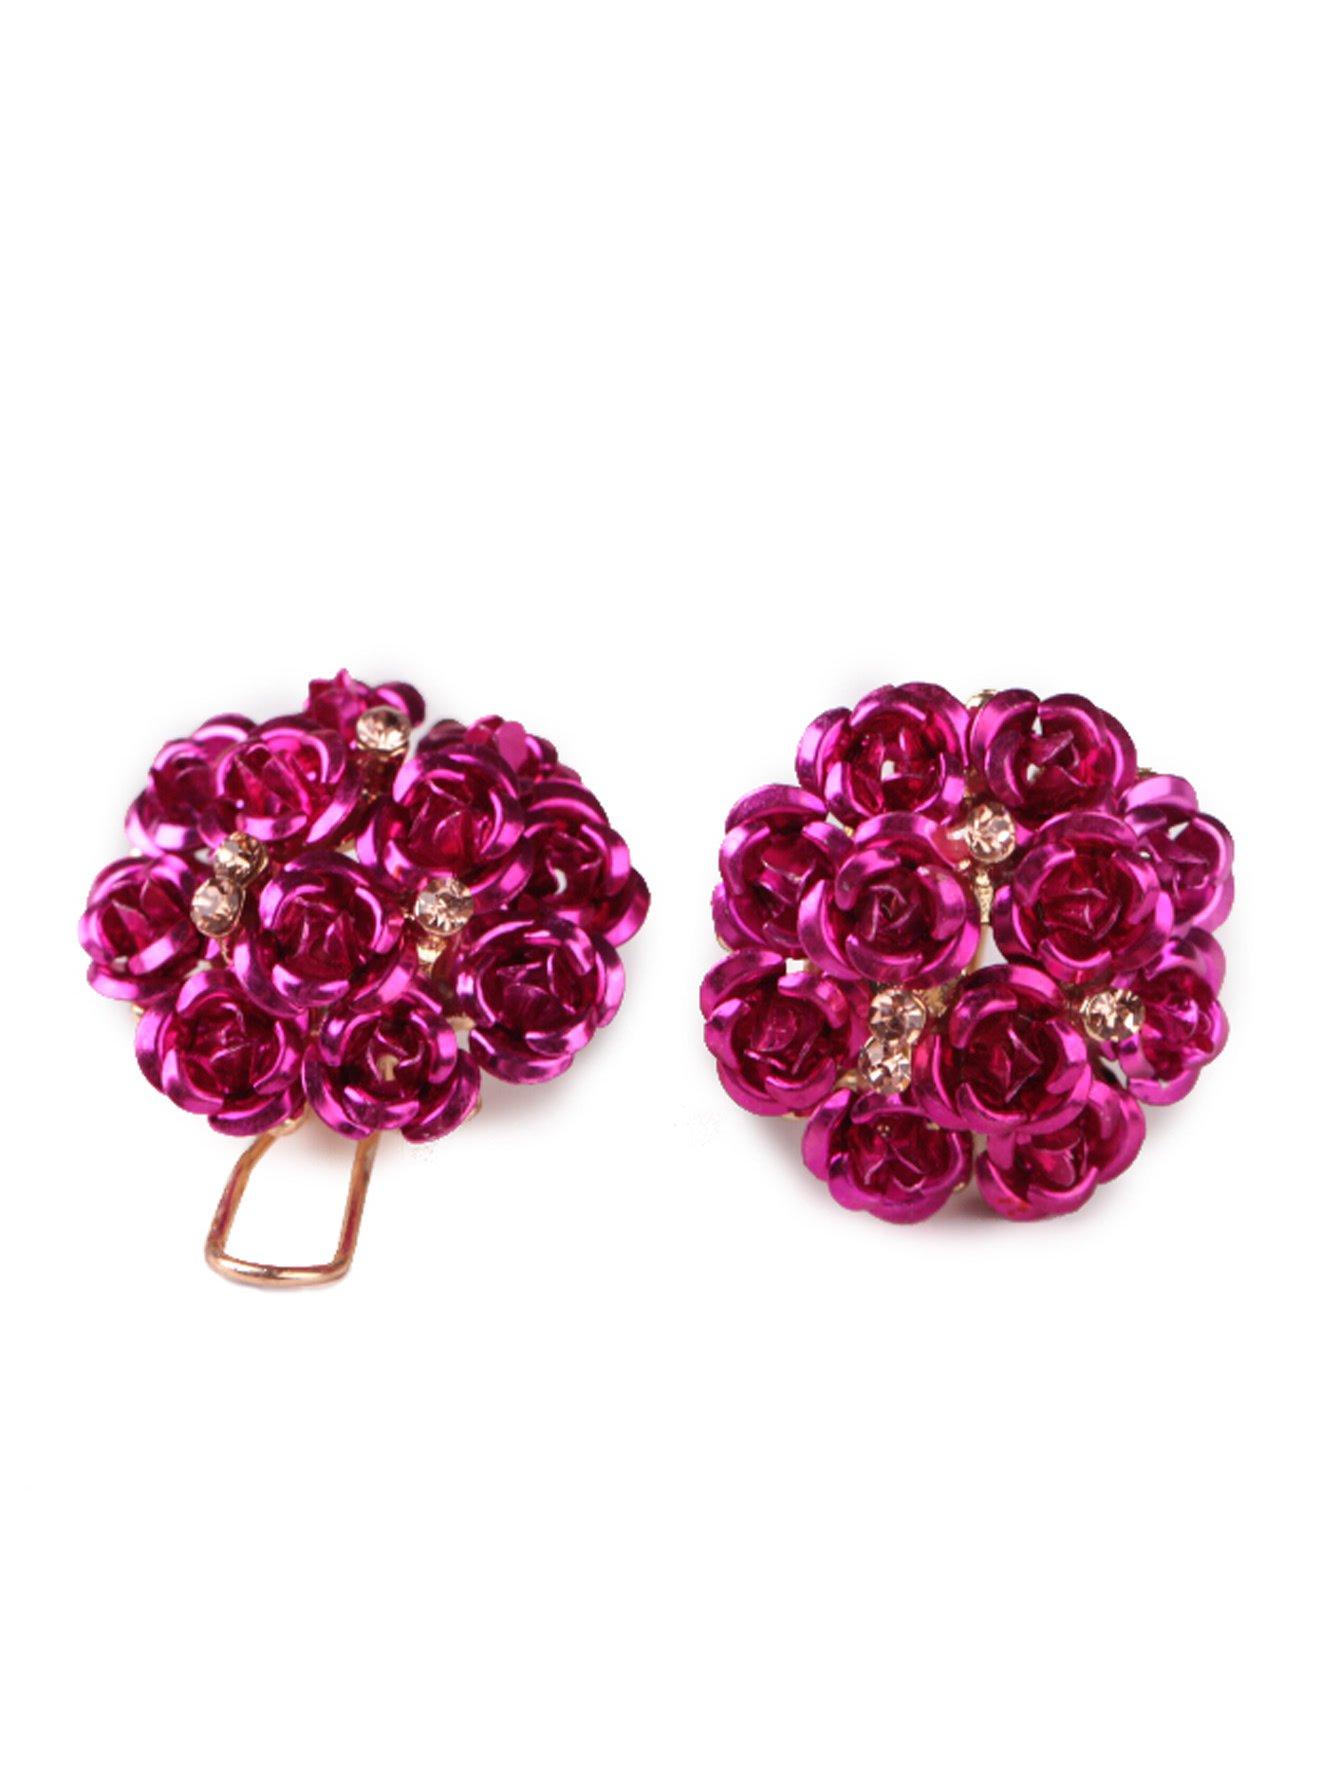 Rose Design Stud Earrings